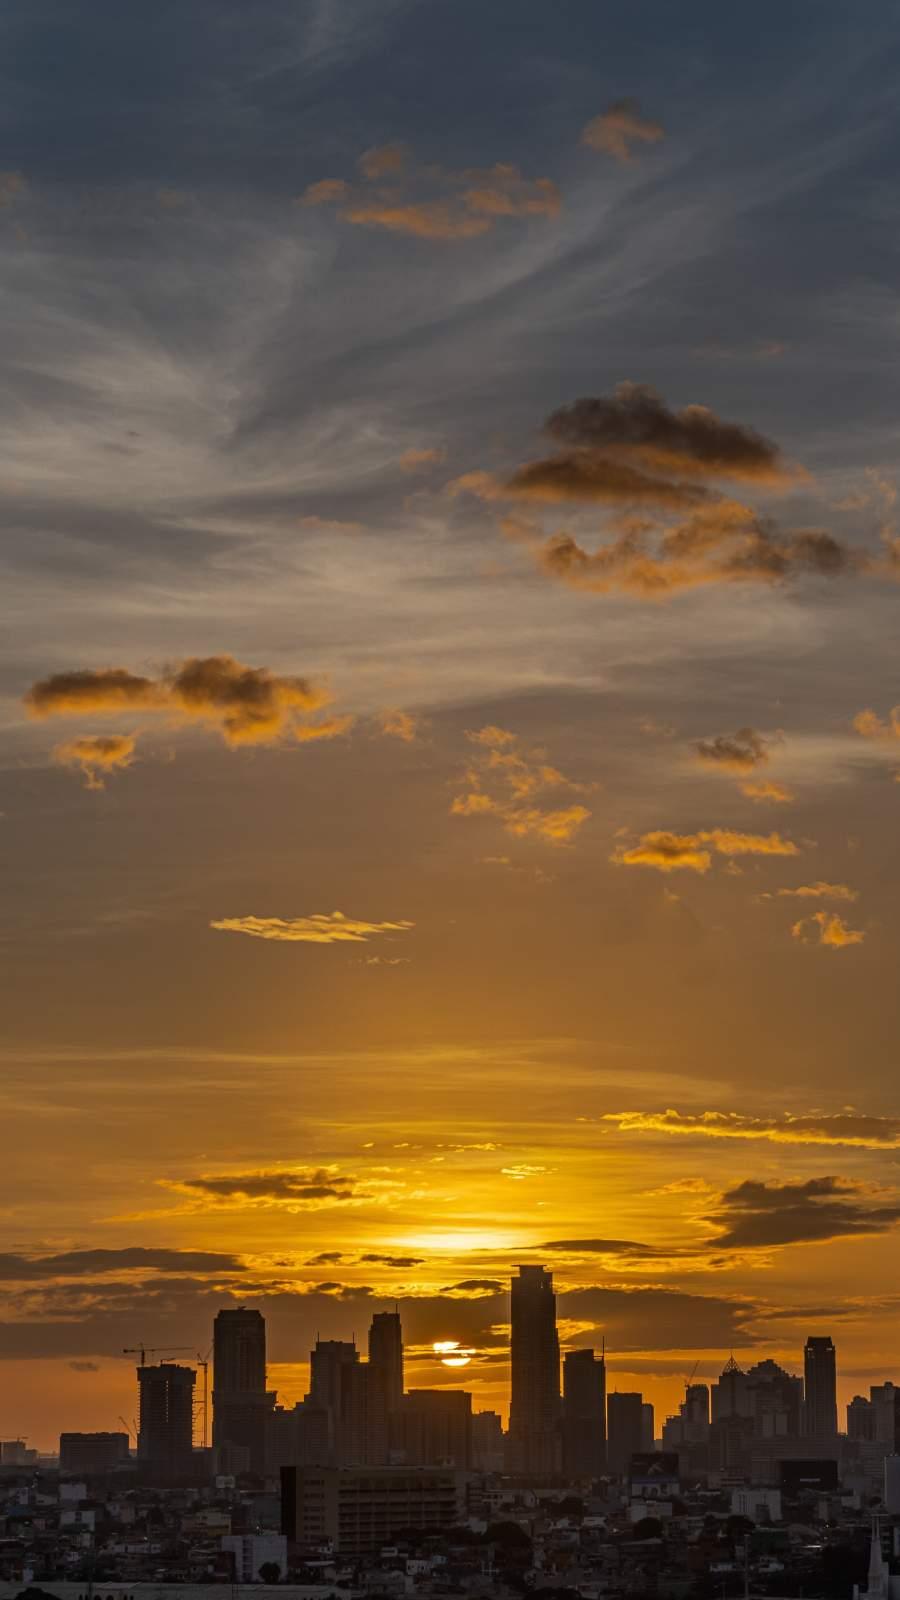 City Sunset Sky iPhone Wallpaper